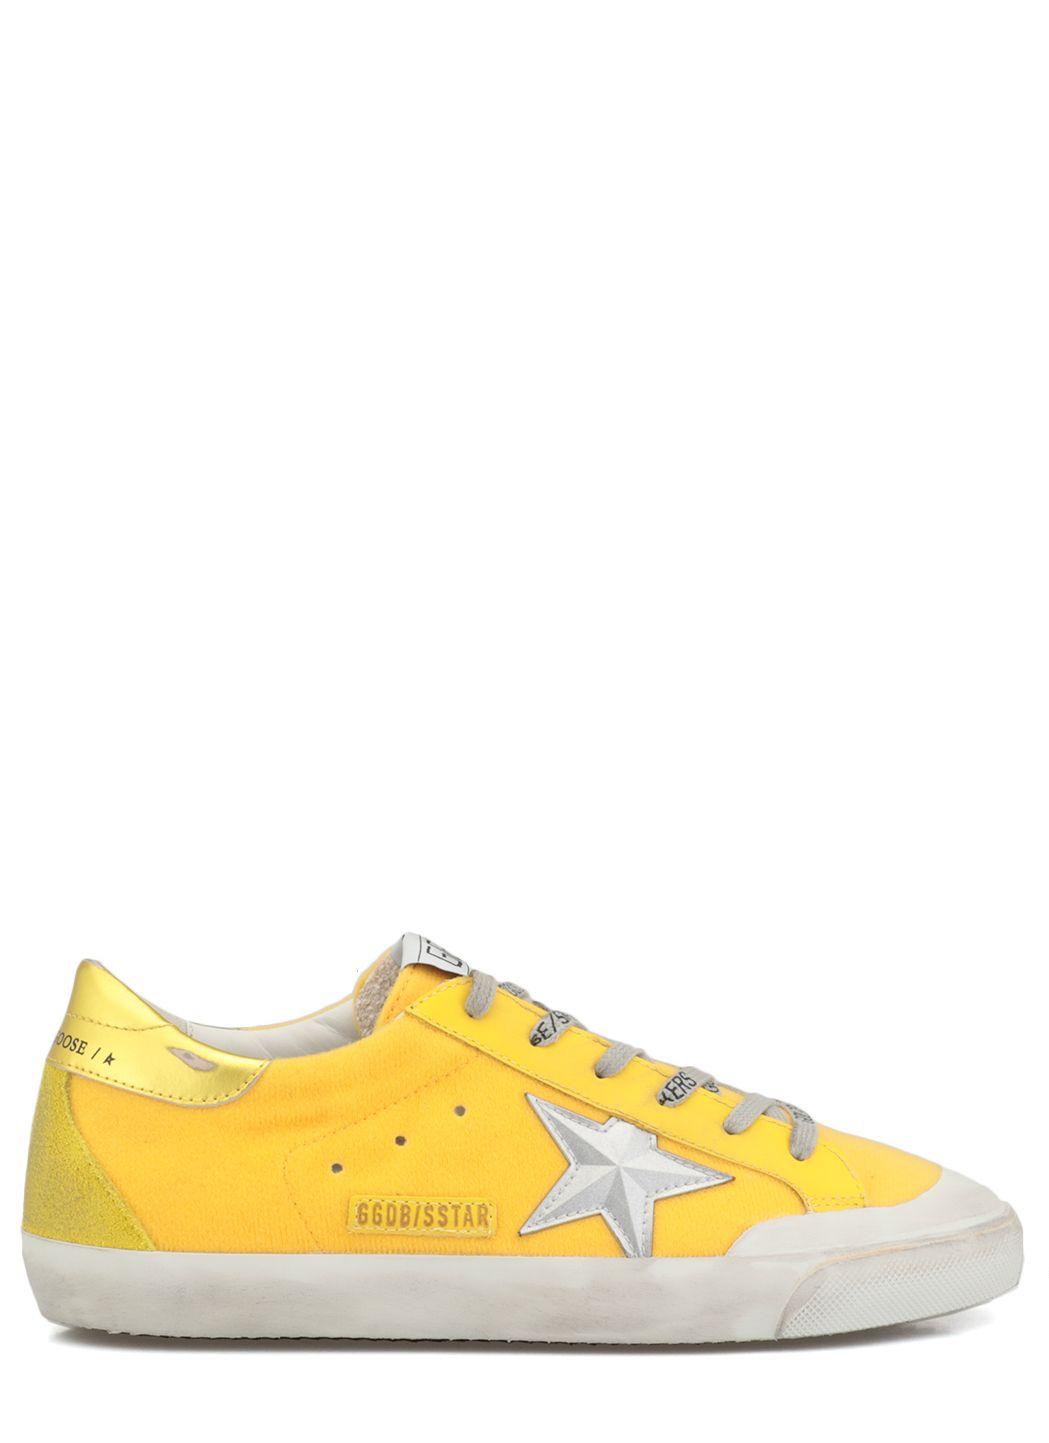 PenStar Super Star Sneakers